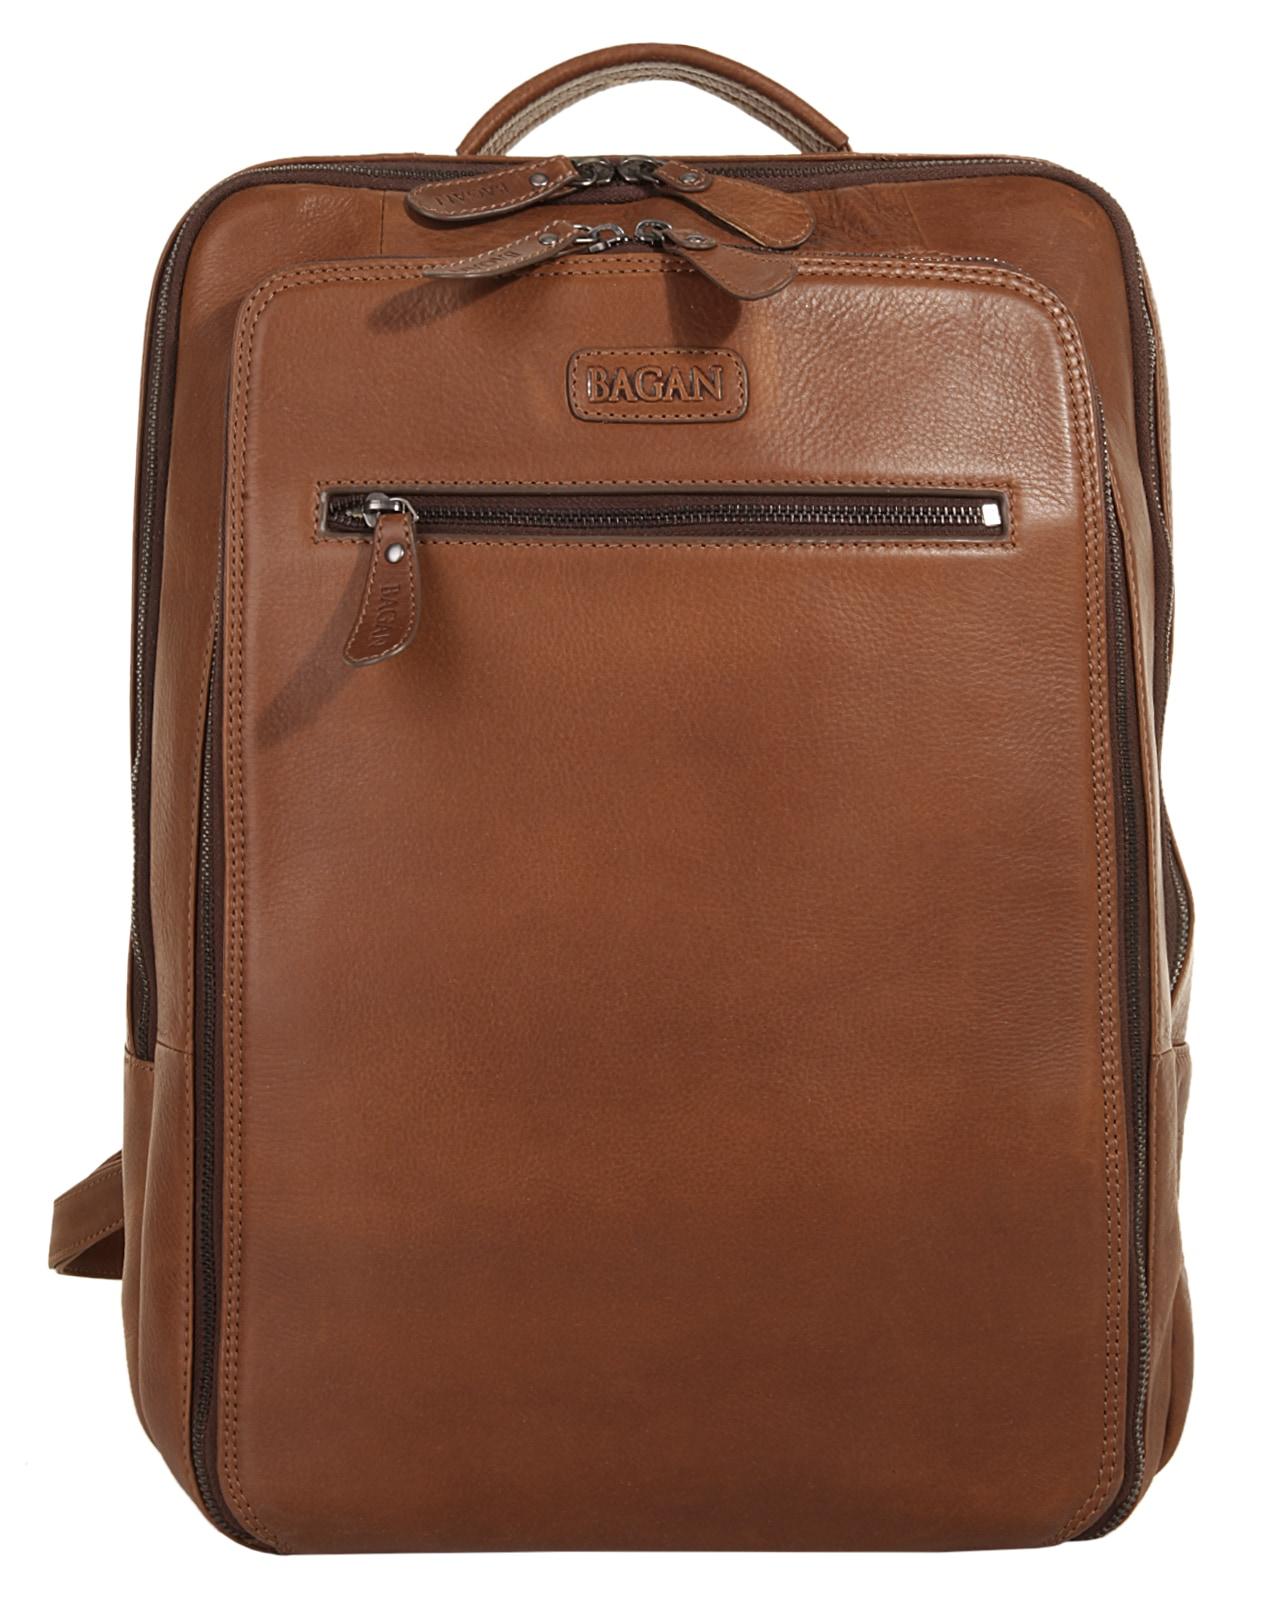 Bagan Laptoprucksack Technik & Freizeit/Reisegepäck & Taschen/Laptoptaschen/Laptoprucksack